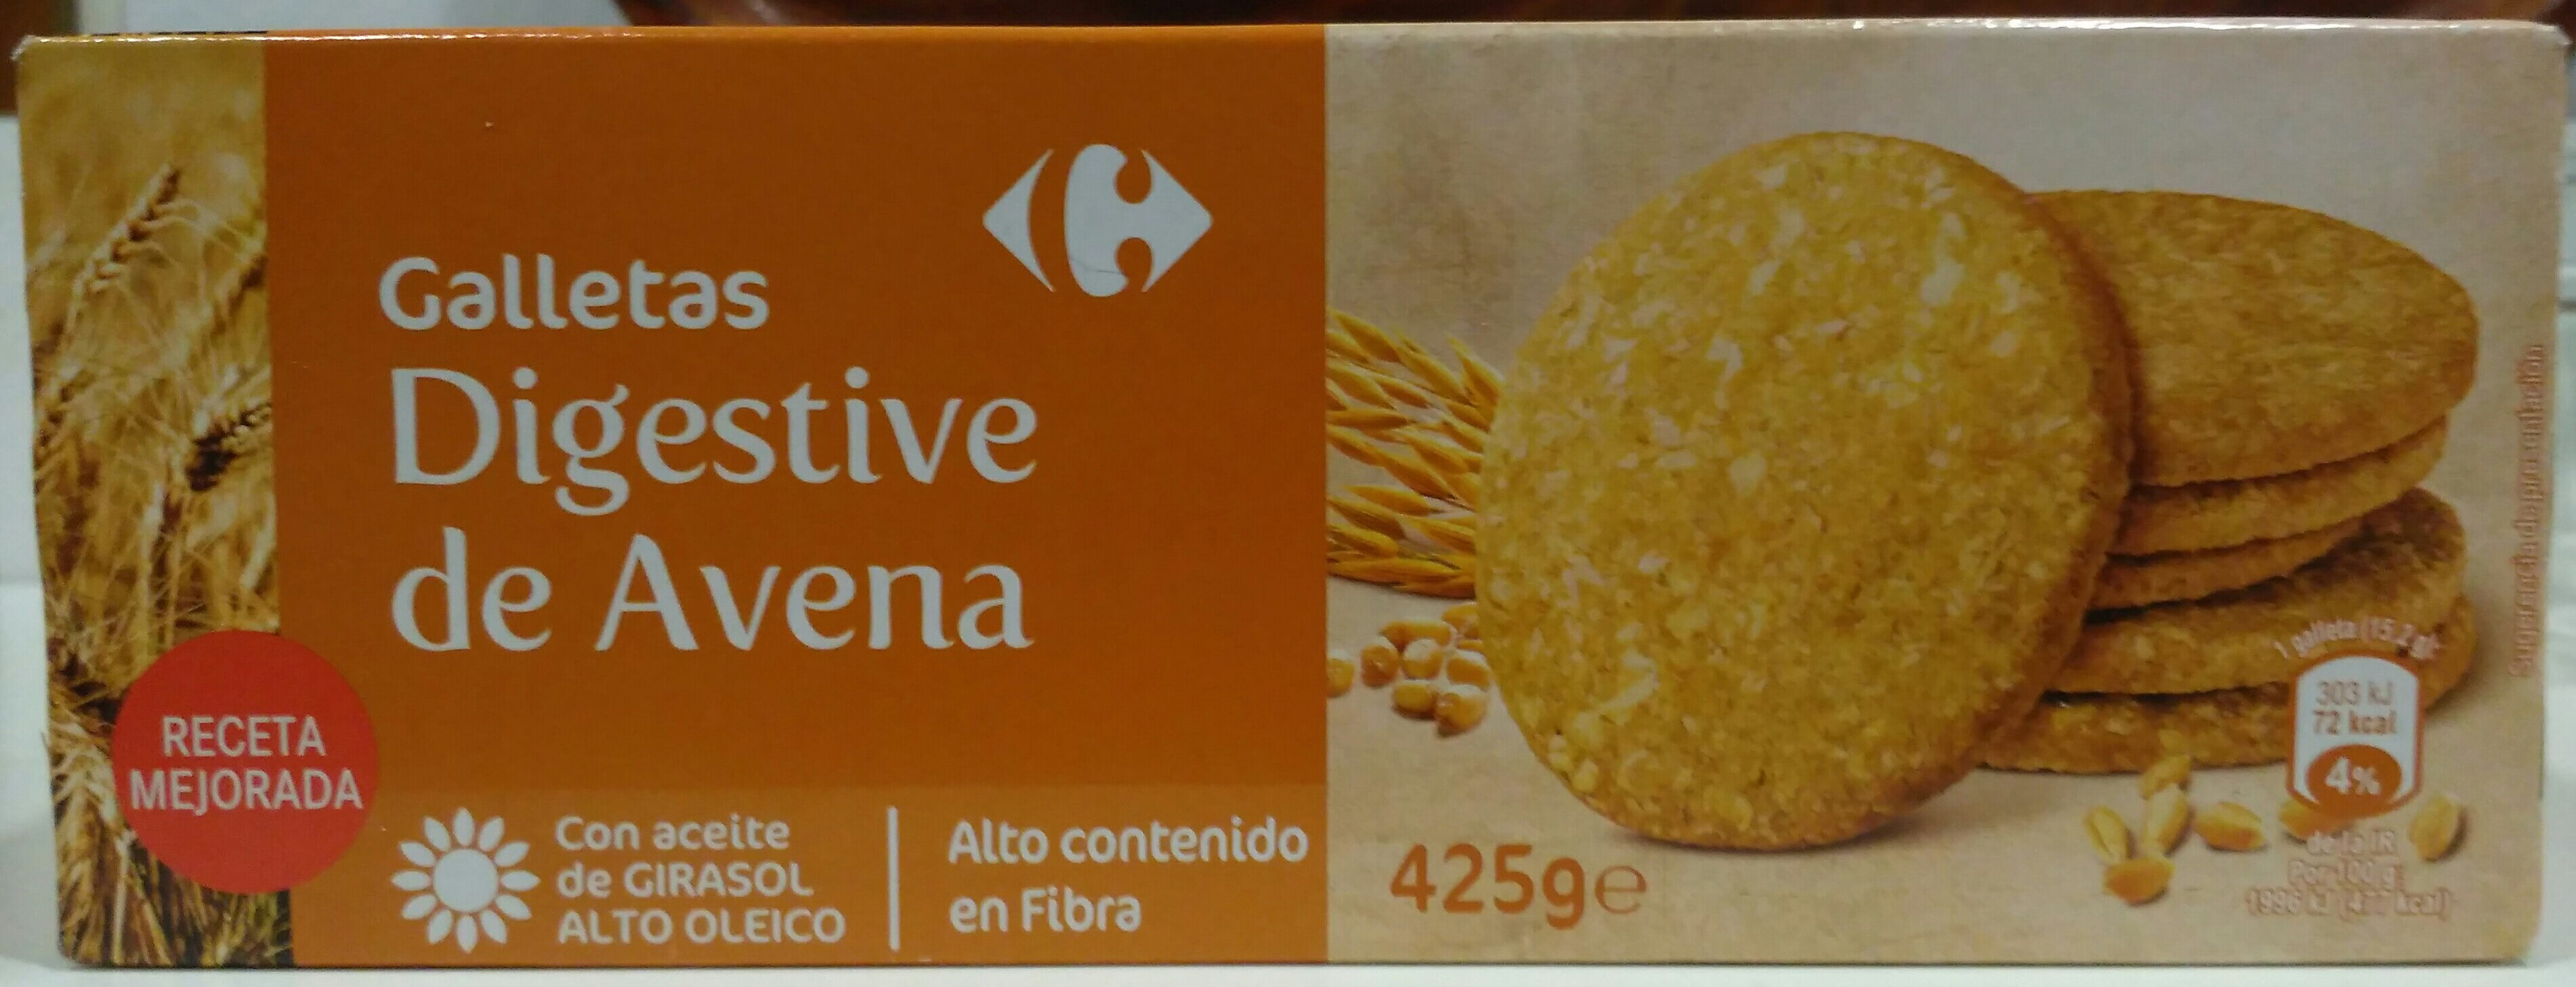 Galletas digestivo de avena - Produkt